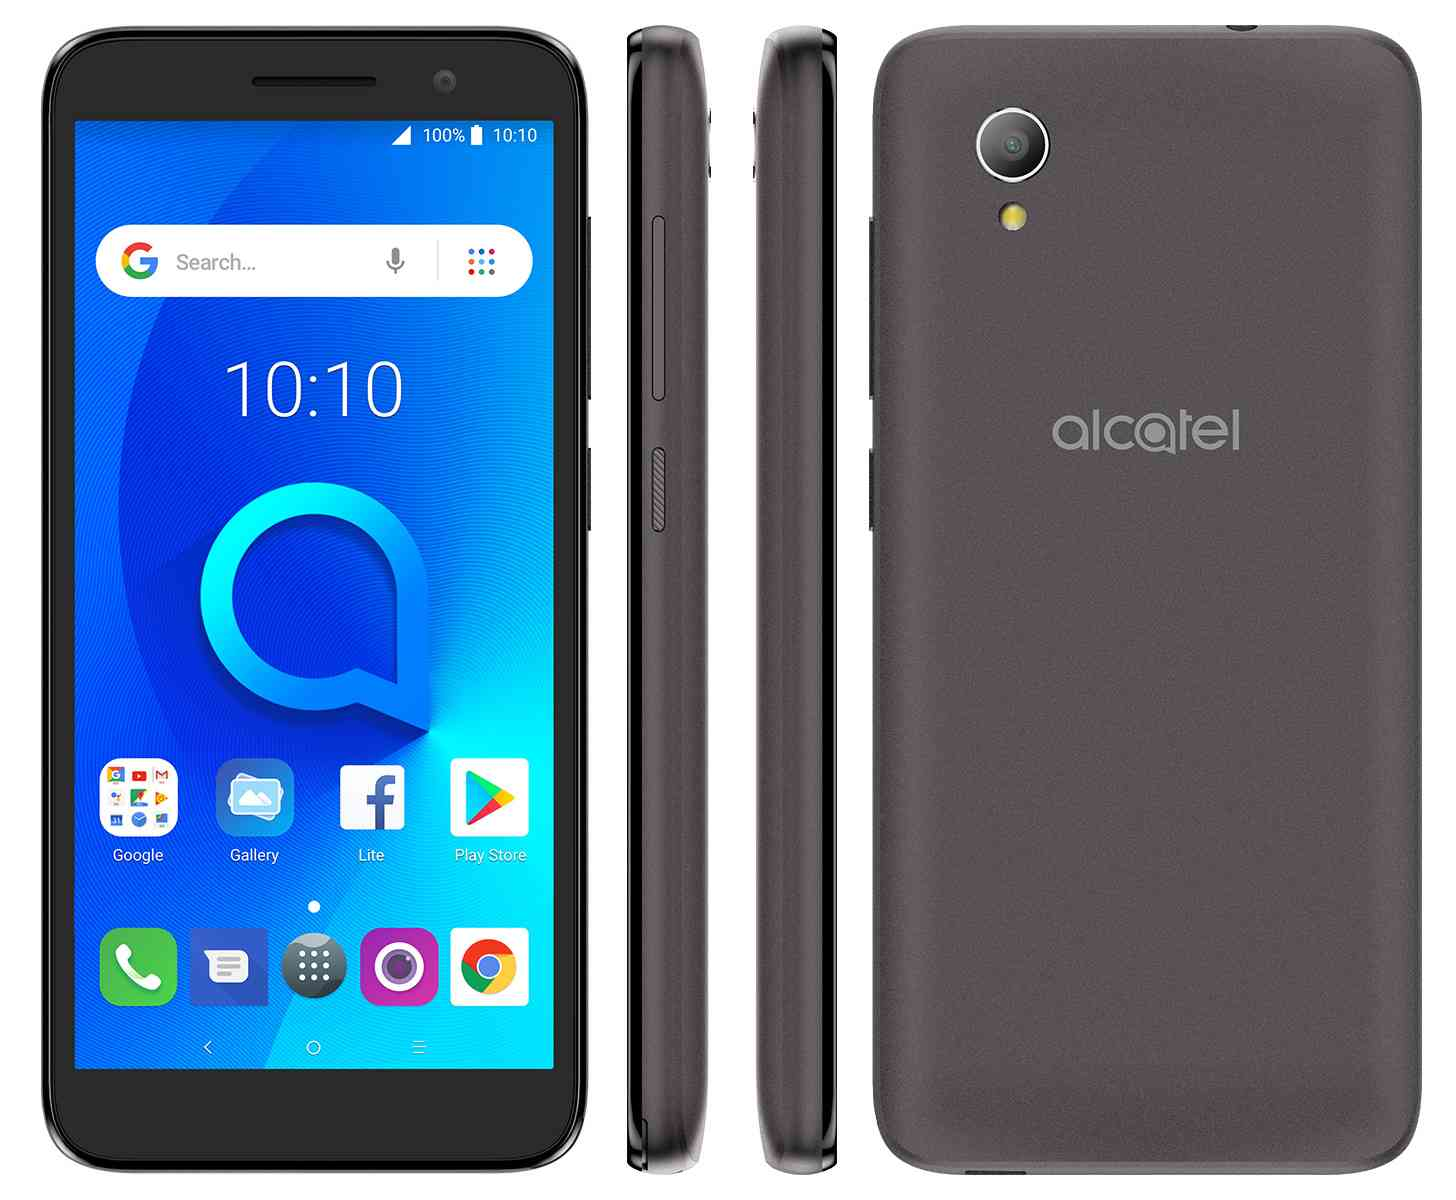 Alcatel 1 Android Go